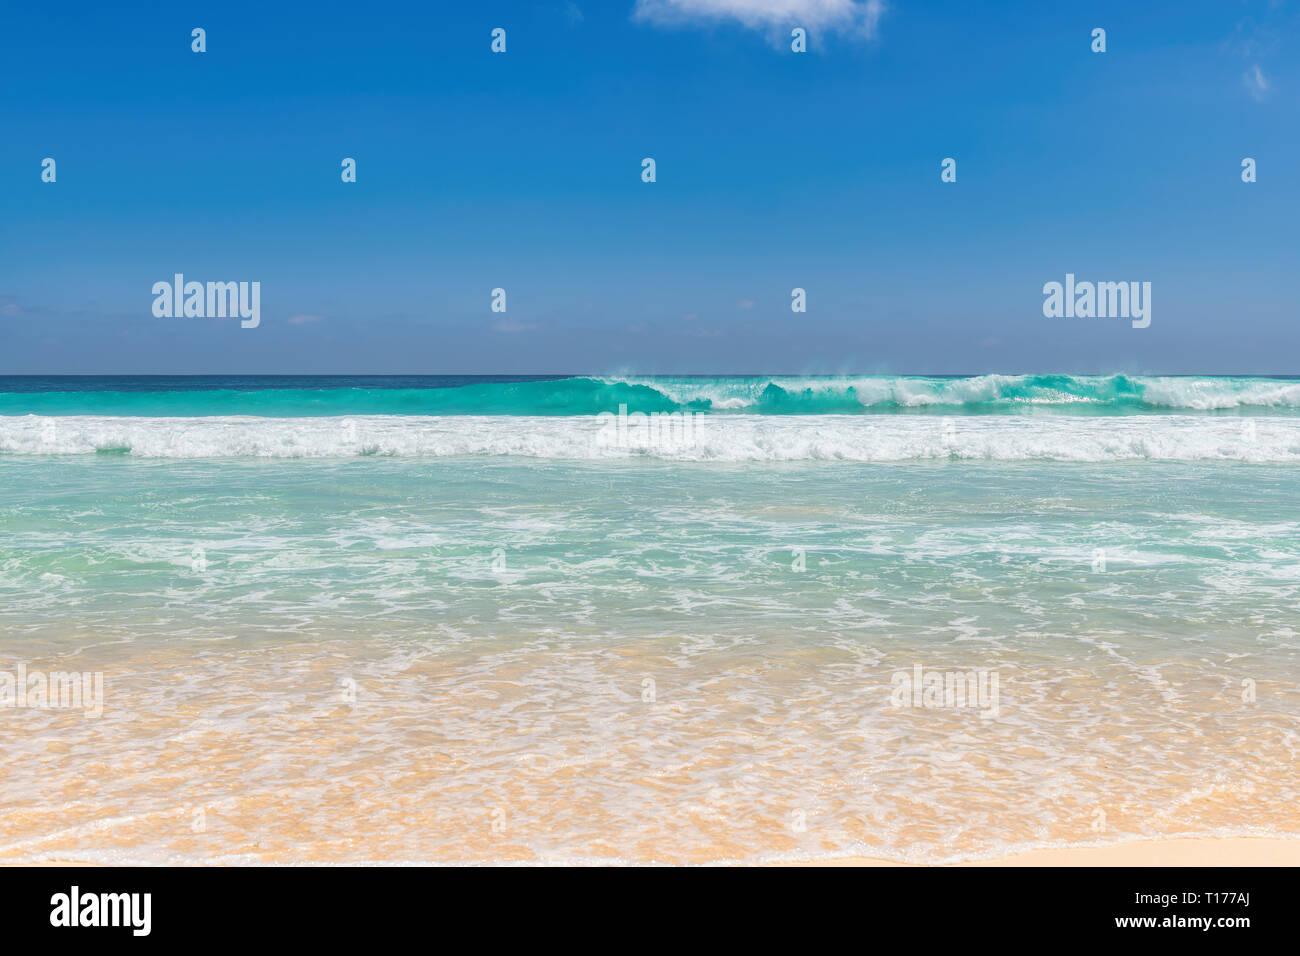 Hermosa playa en Paradise Island. Foto de stock